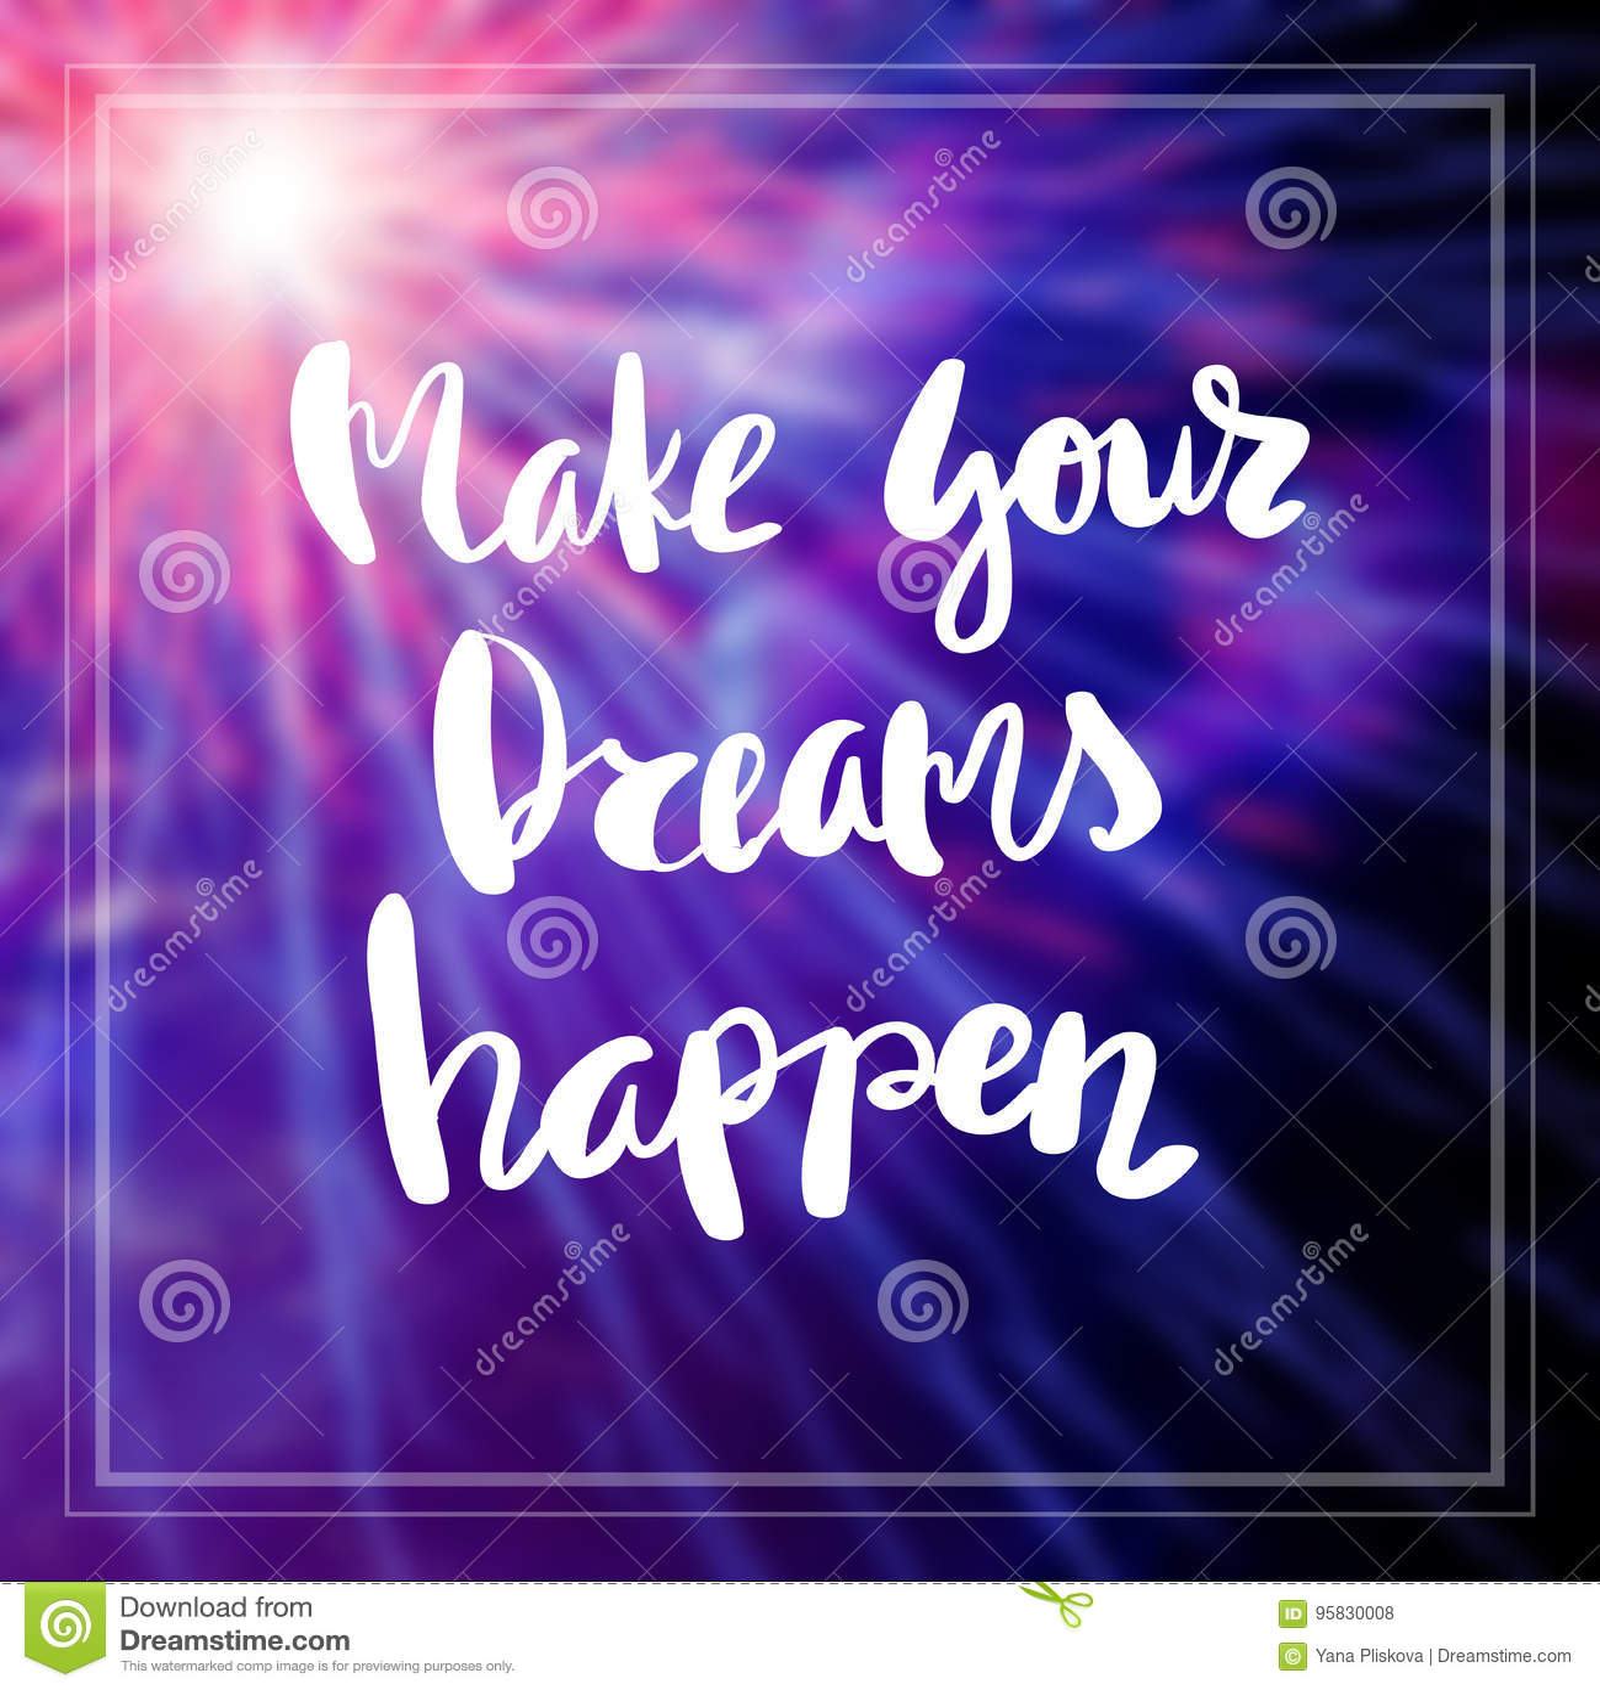 Motivational Quote on purple color background Make your dreams happen